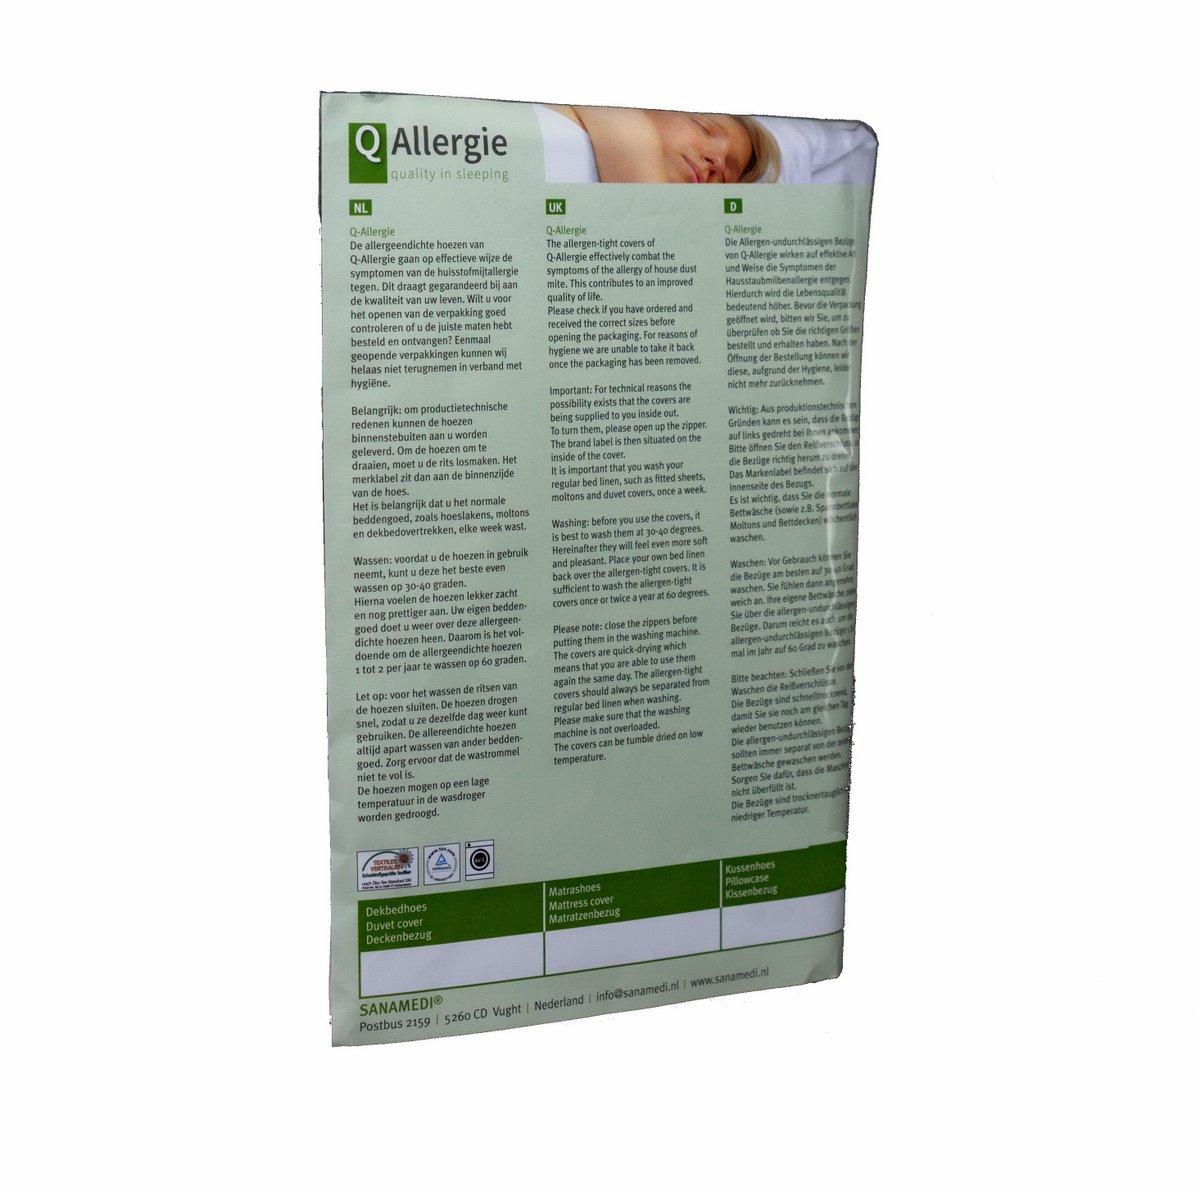 Kussenhoes Q-Allergie 60 x 60 cm